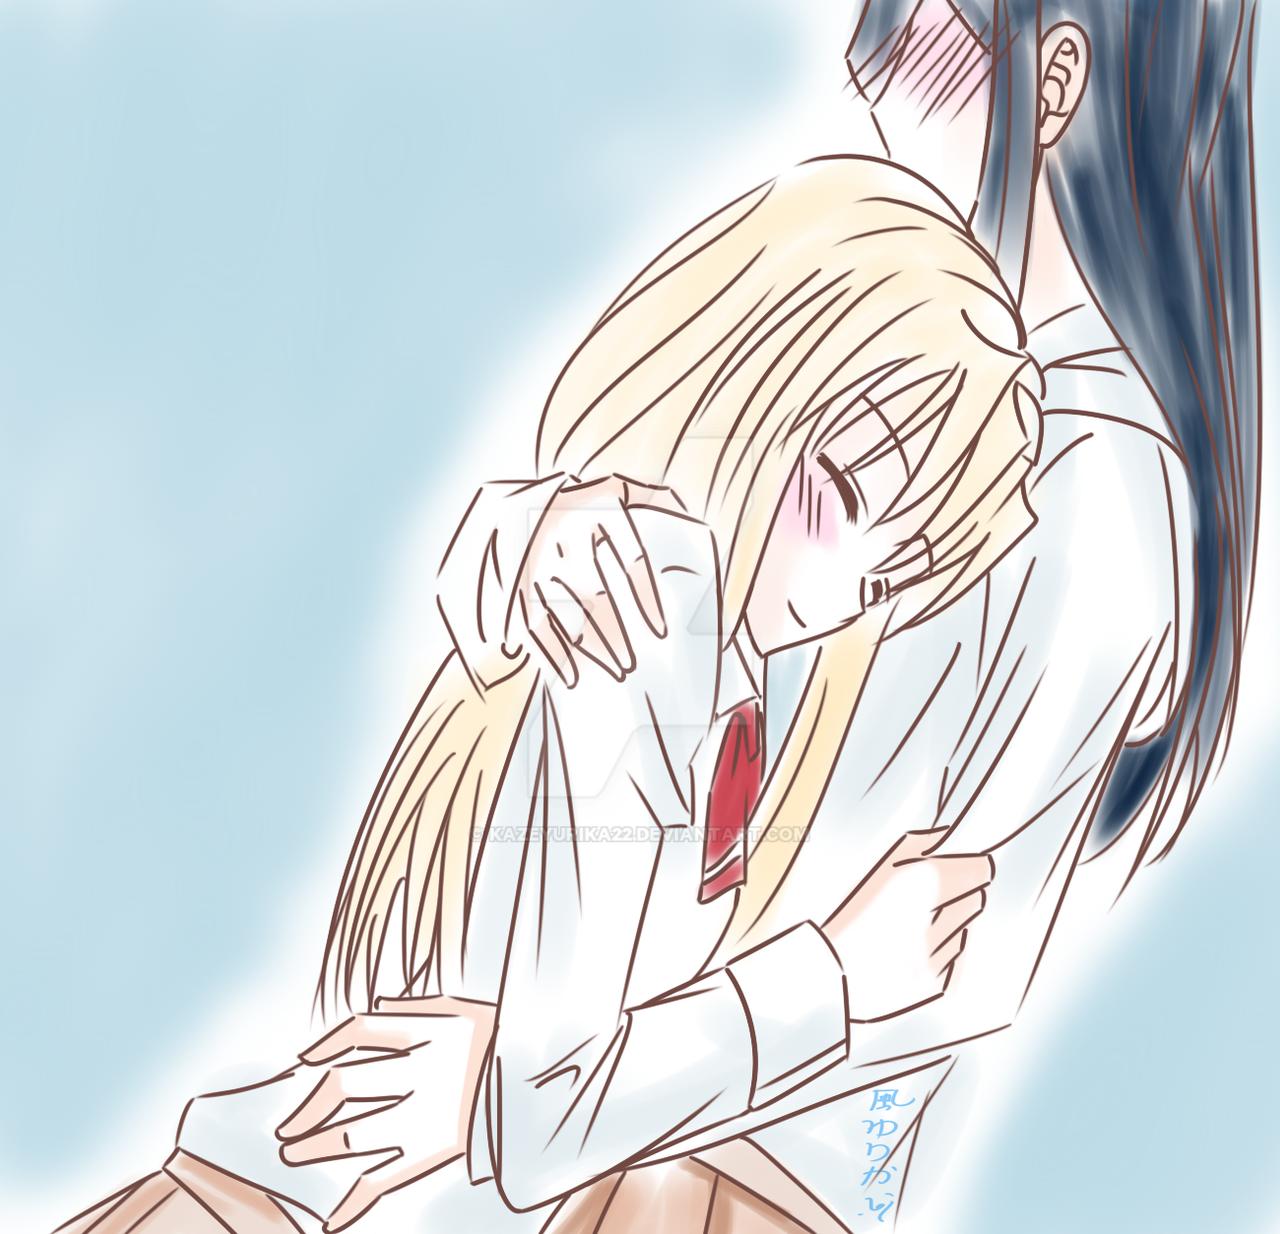 ShizNat - I Love You by kazeyurika22